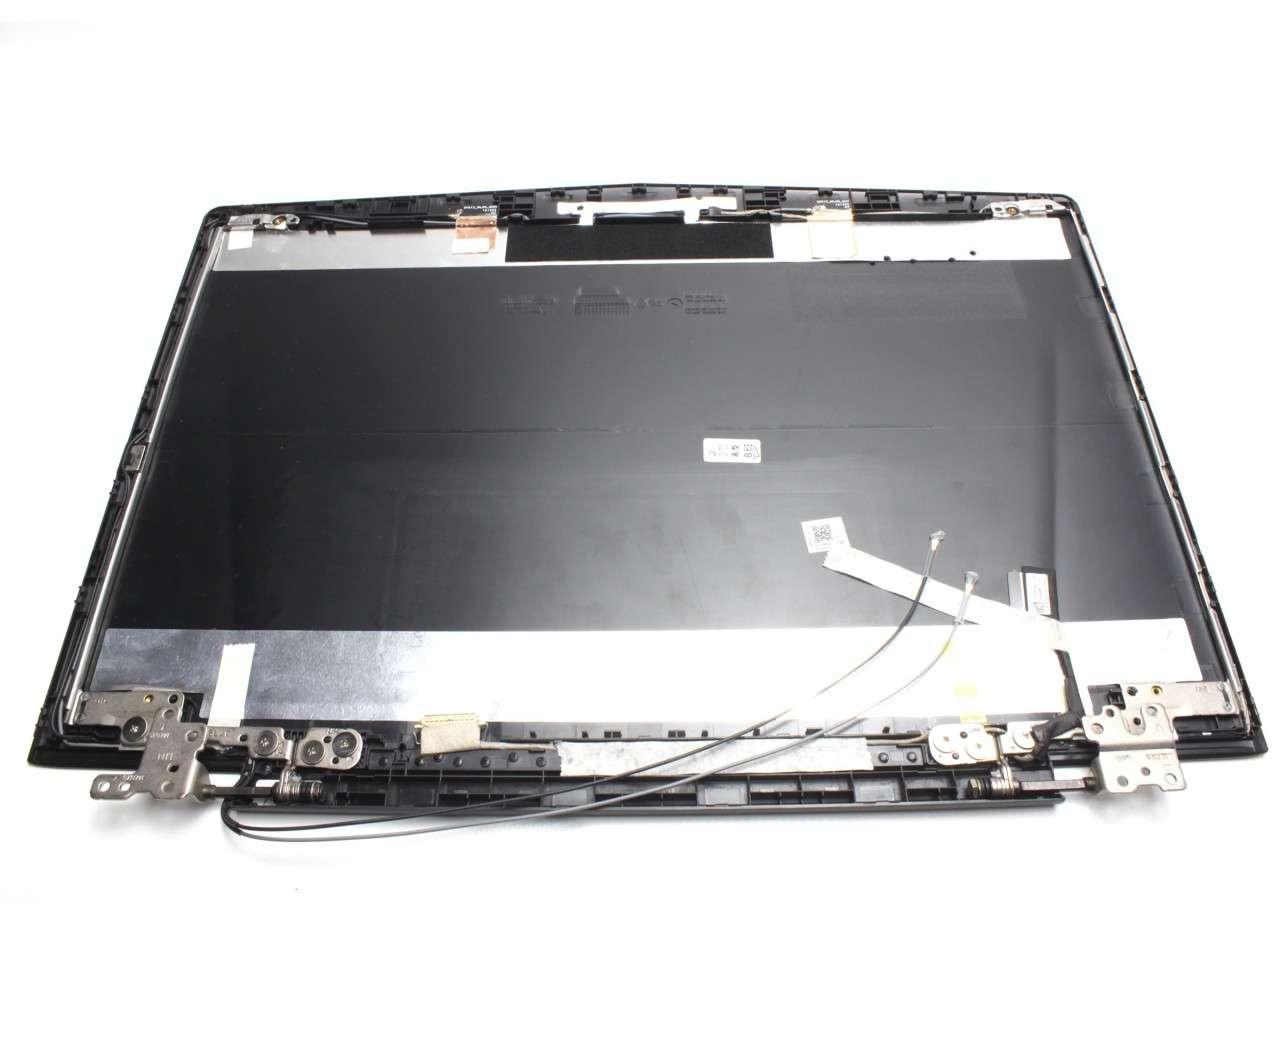 Capac Display BackCover Lenovo Legion R520 Carcasa Display cu Balamale imagine powerlaptop.ro 2021